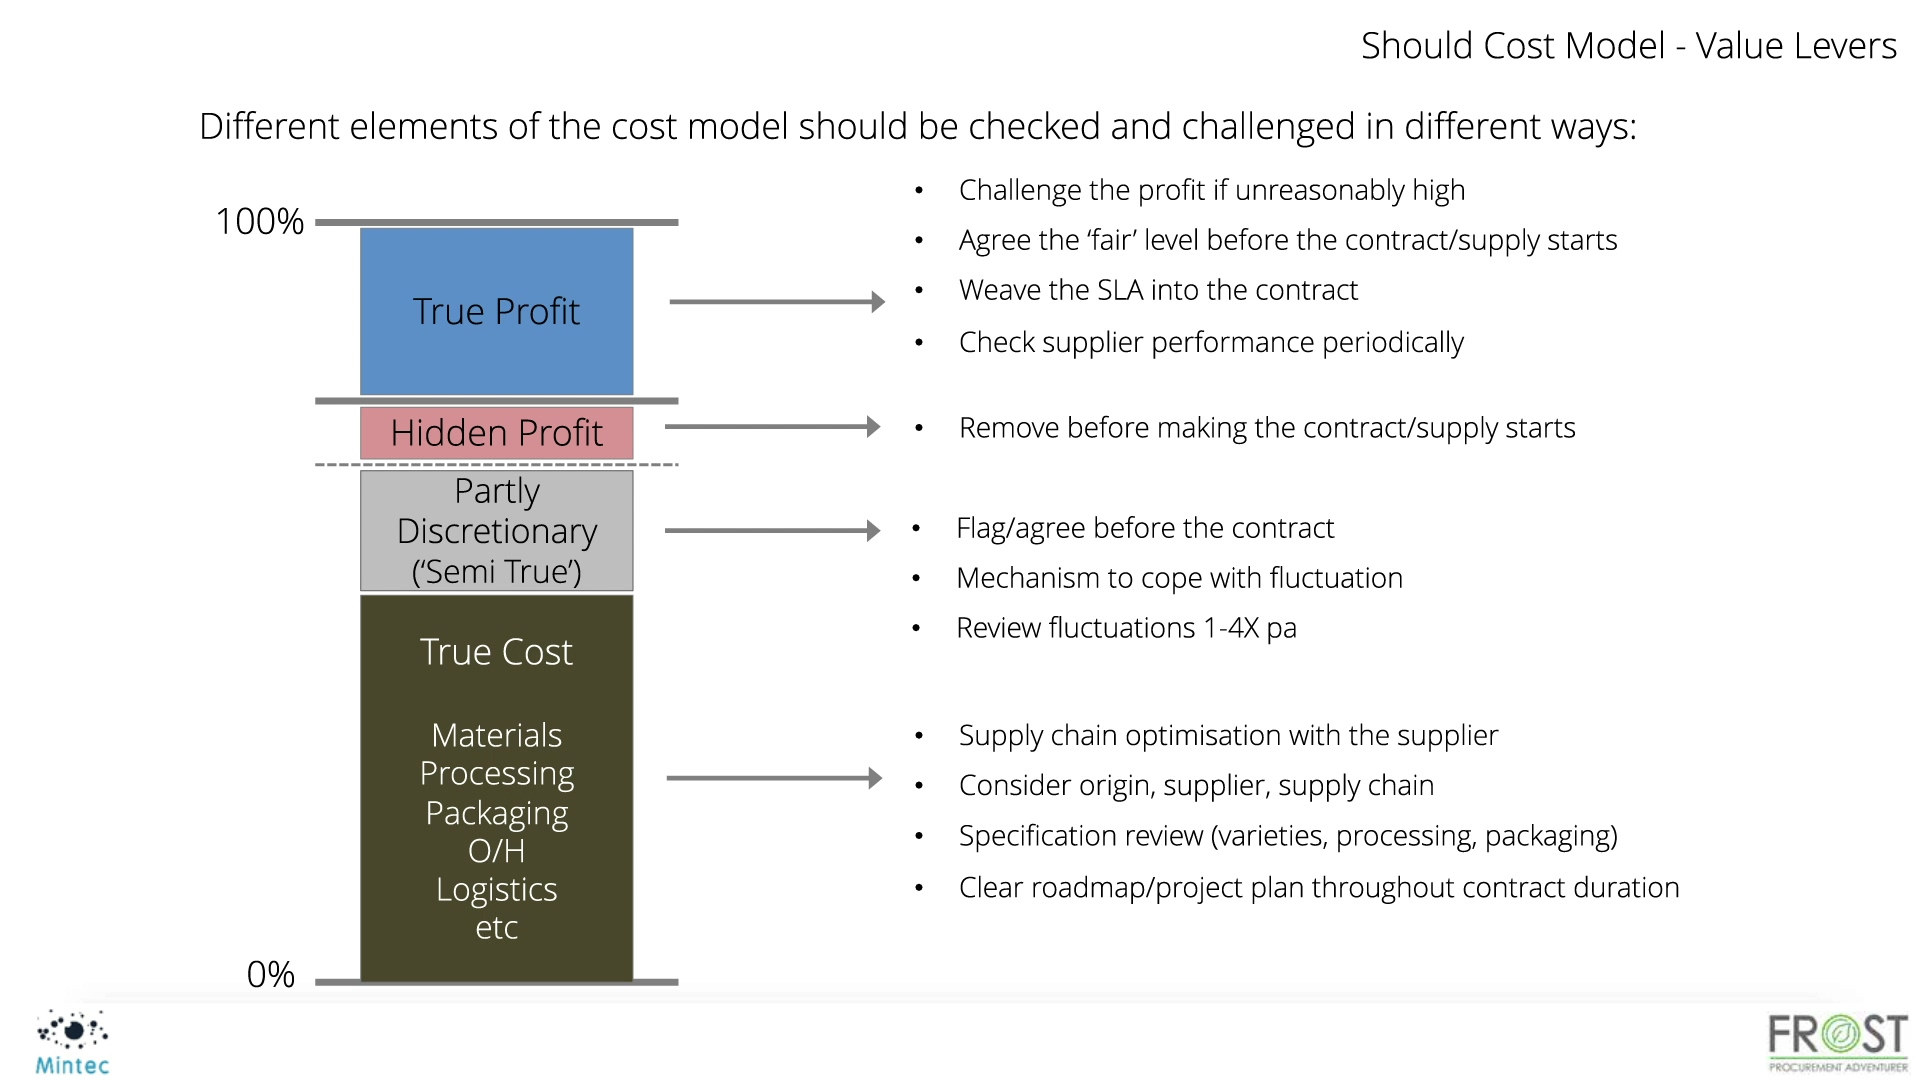 SF Mintec Cost Modelling Webinar - Part 2